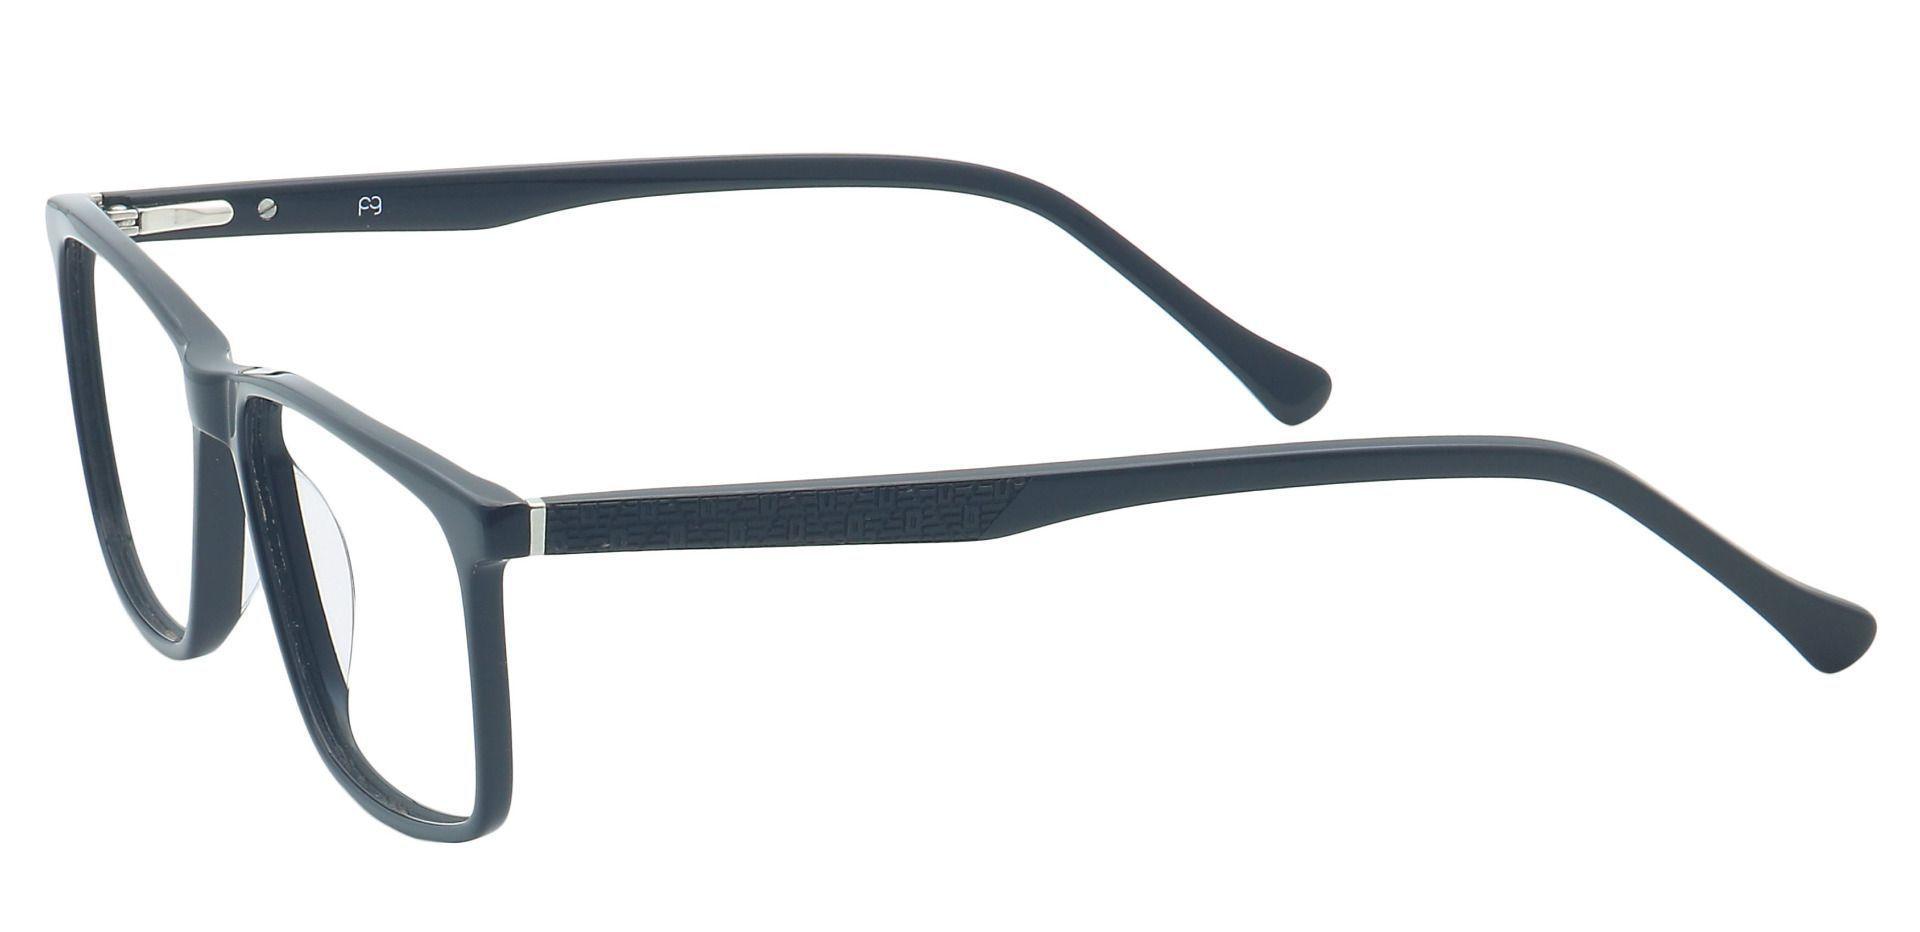 Vance Rectangle Prescription Glasses - Black